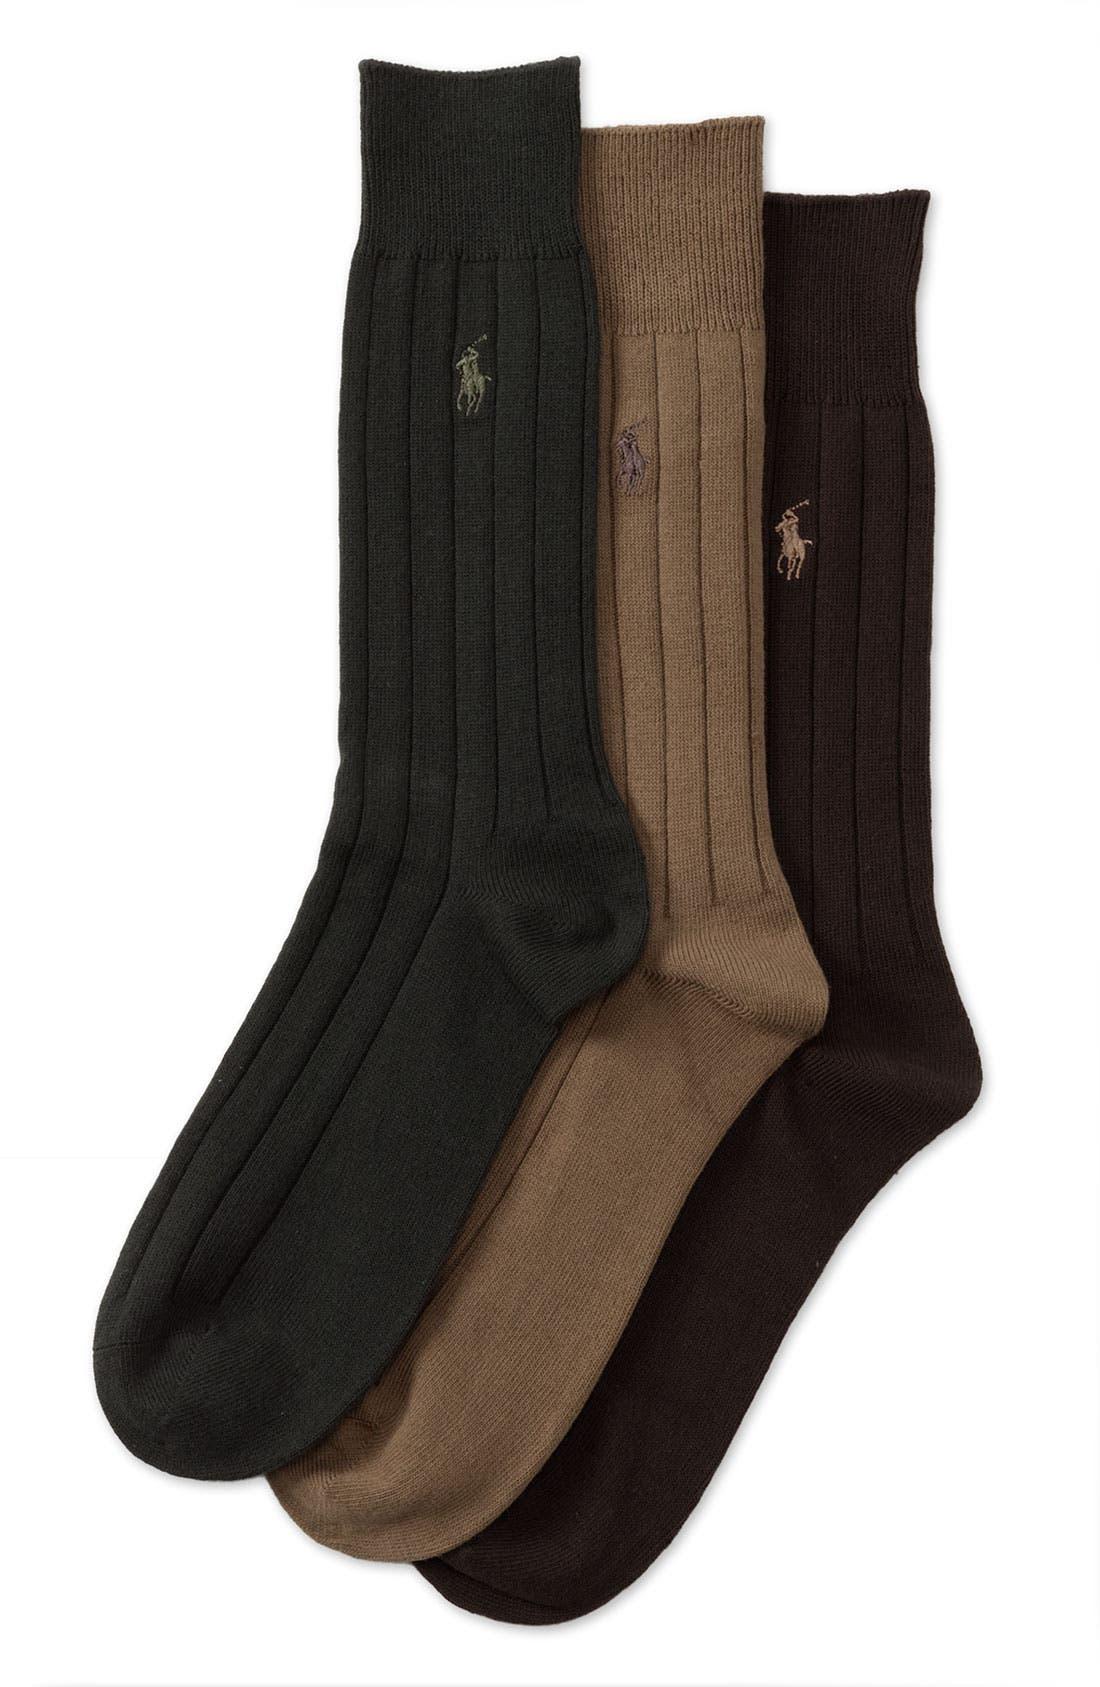 3-Pack Crew Socks,                             Main thumbnail 1, color,                             Tobacco, Olive, Brown